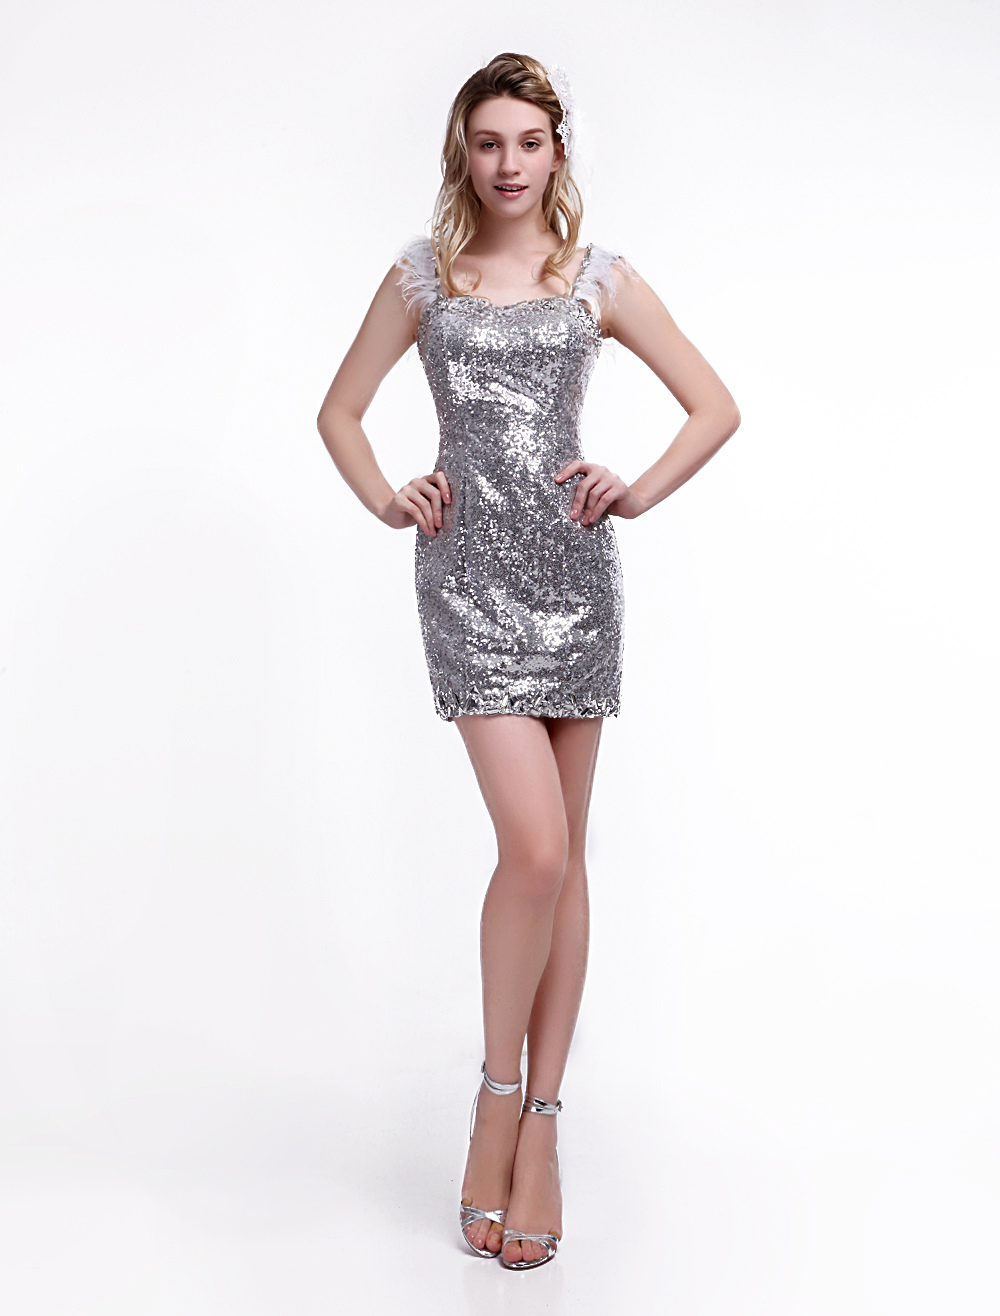 f6d20e0346 Vestido de fiesta con lentejuelas plateadas y escote de corazón Milanoo -  Milanoo.com